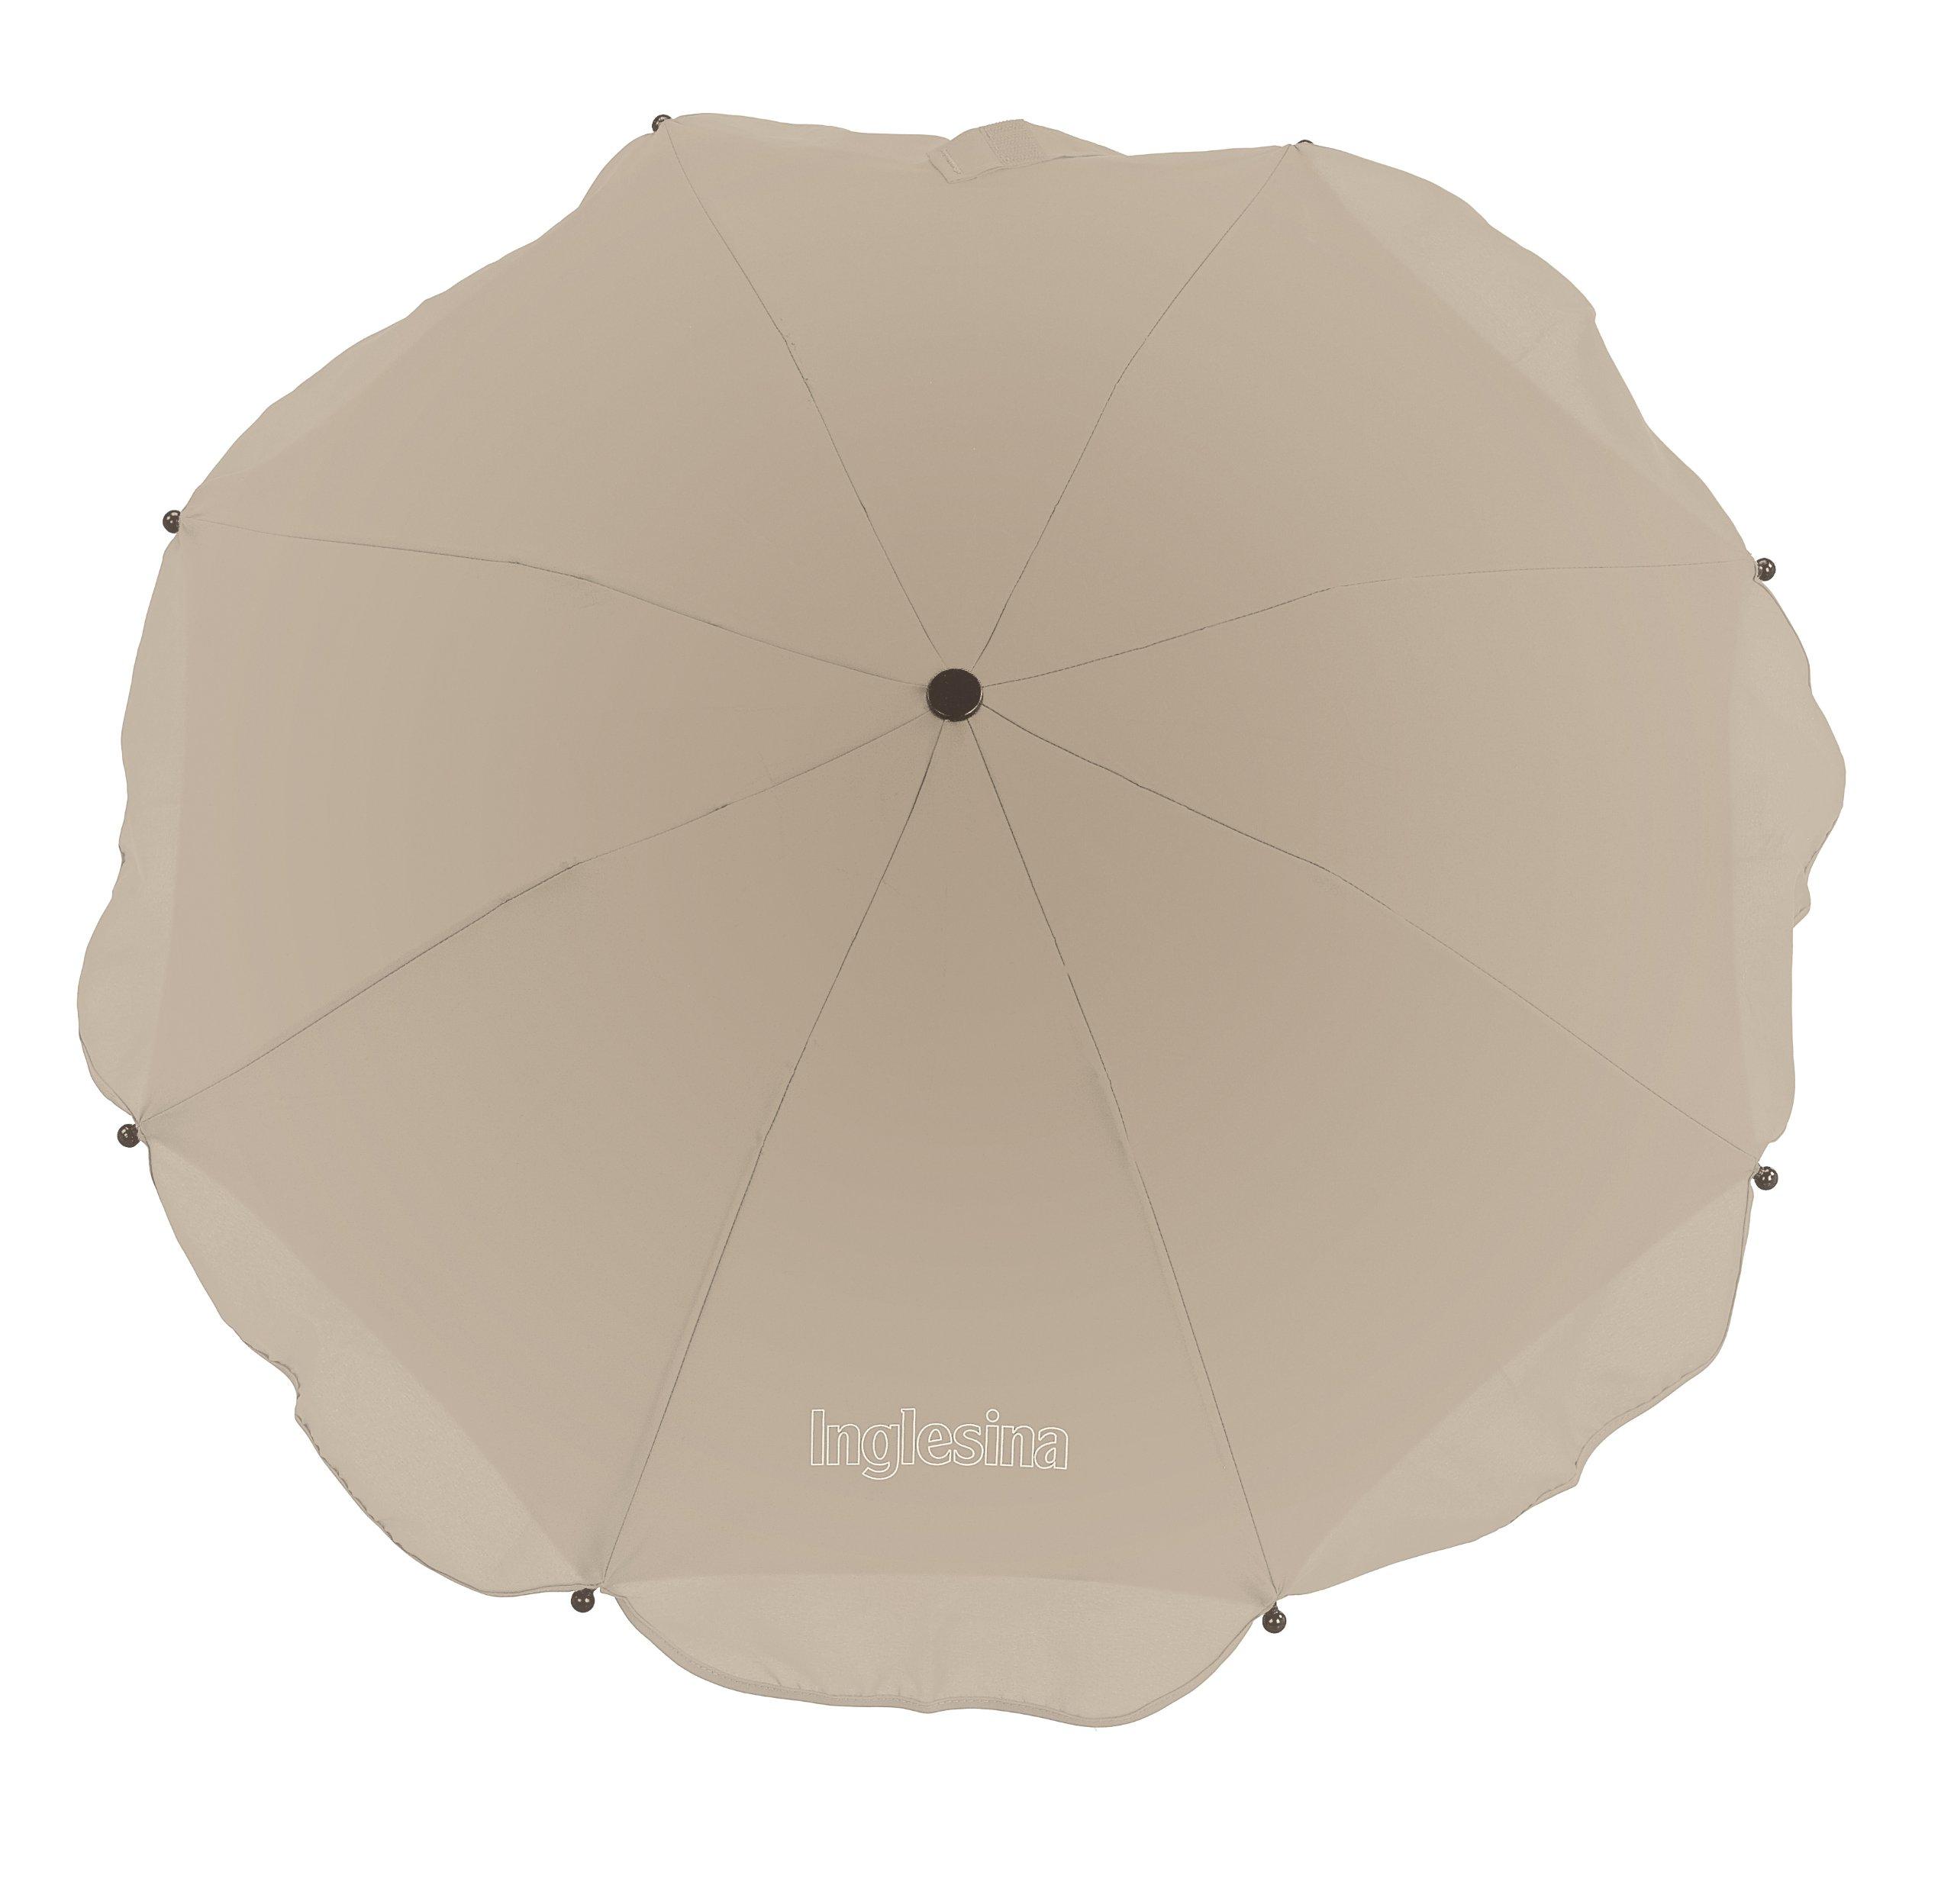 Inglesina Universal Stroller Umbrella Parasol, Cream